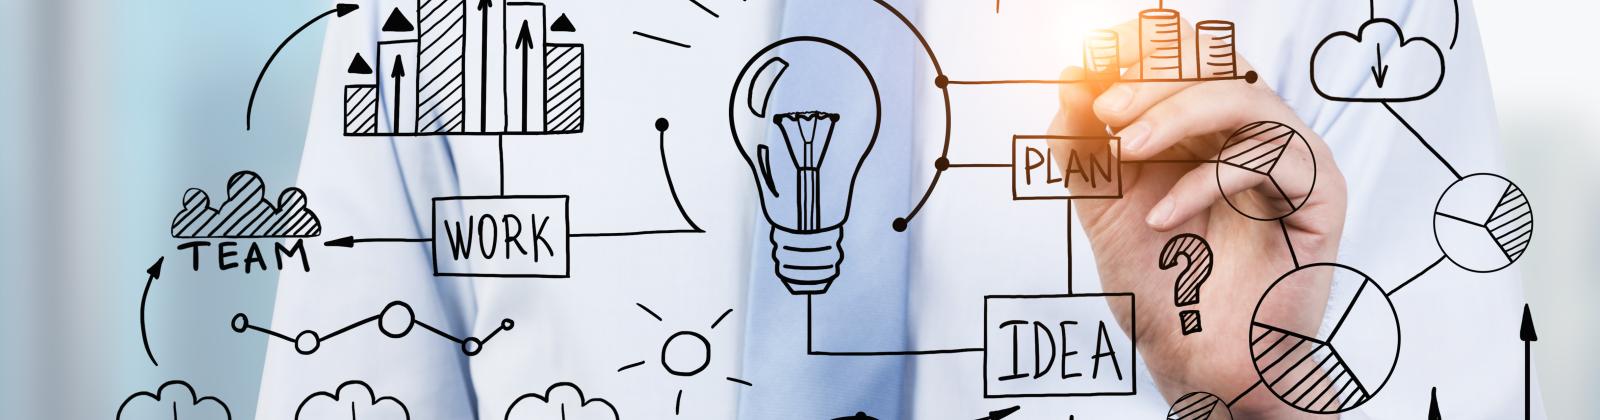 Methode agile conseil en organisation